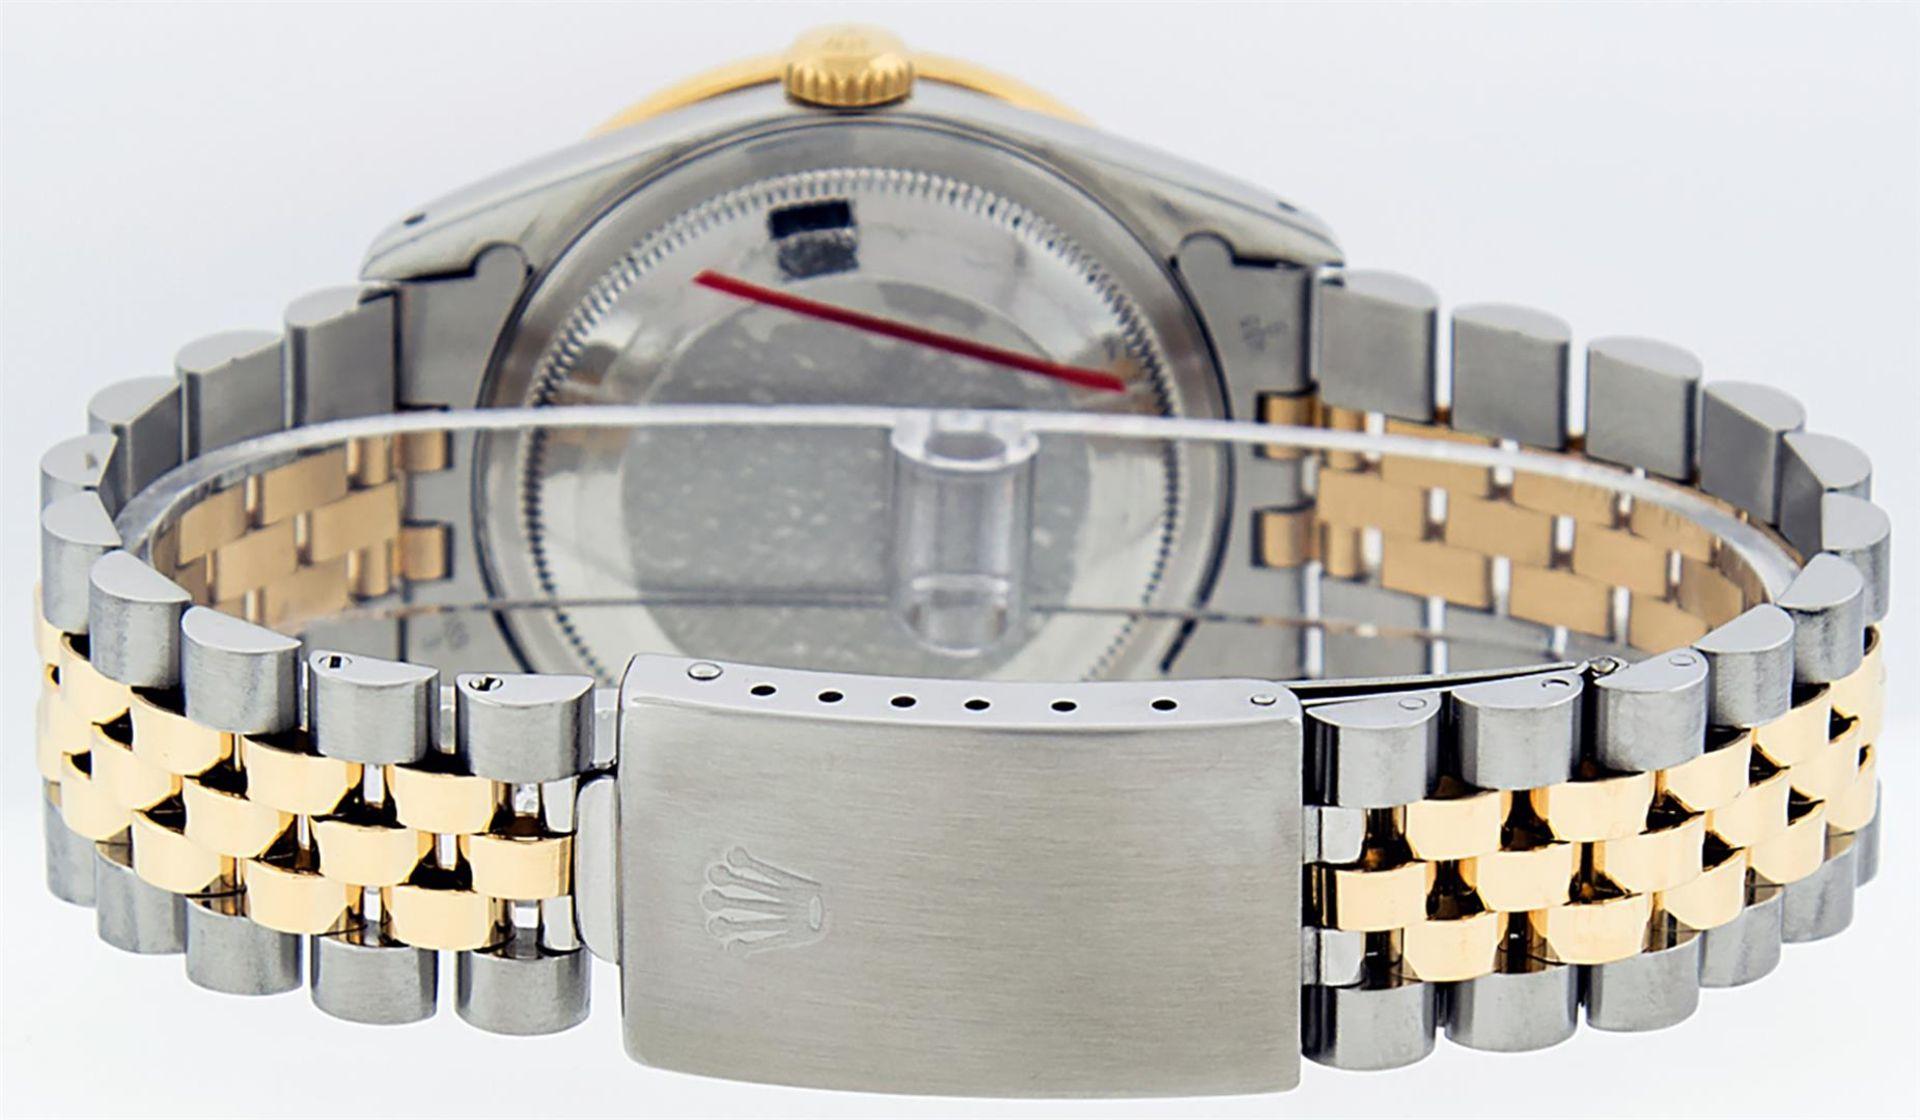 Rolex Mens 2 Tone Blue Vignette String Diamond Lugs Datejust Wristwatch - Image 6 of 8